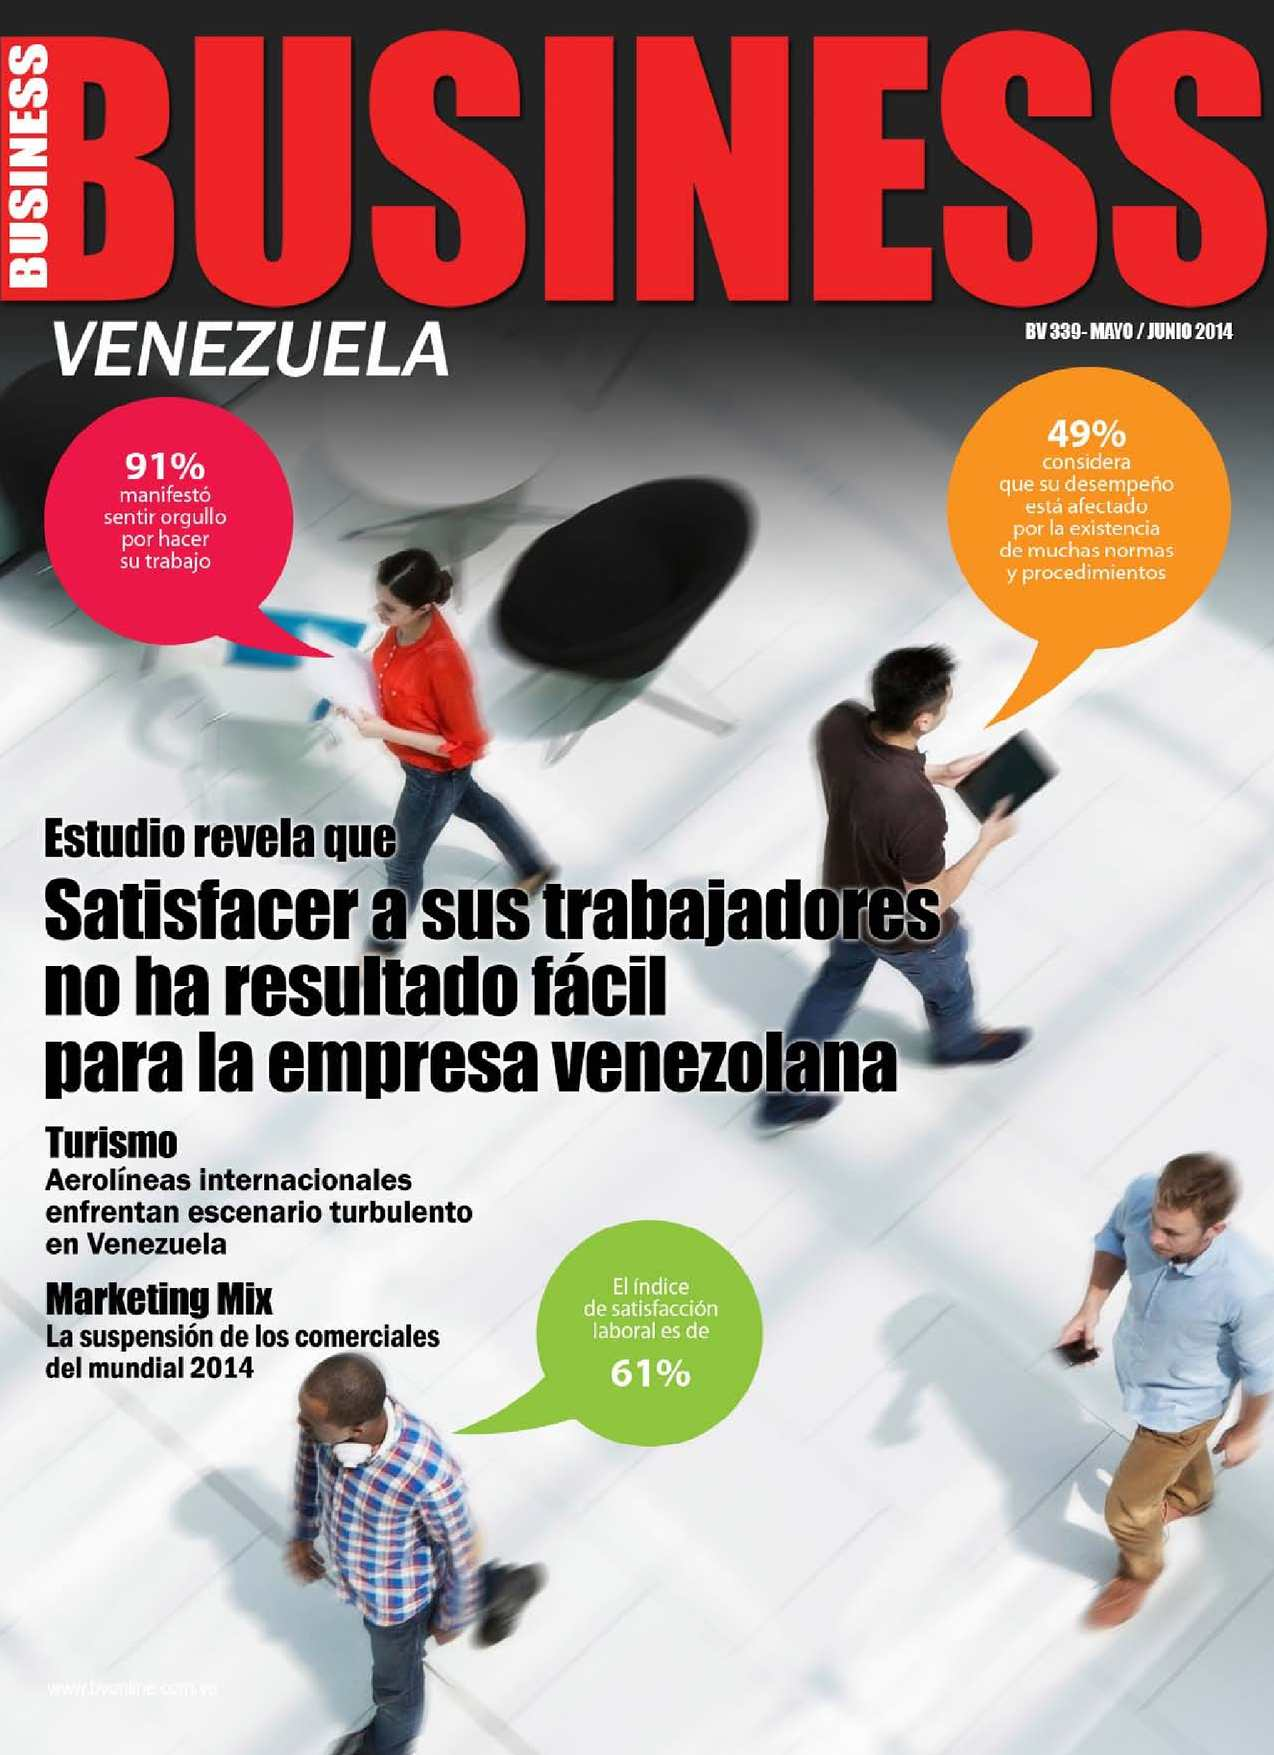 Calaméo - BUSINESS VENEZUELA 339